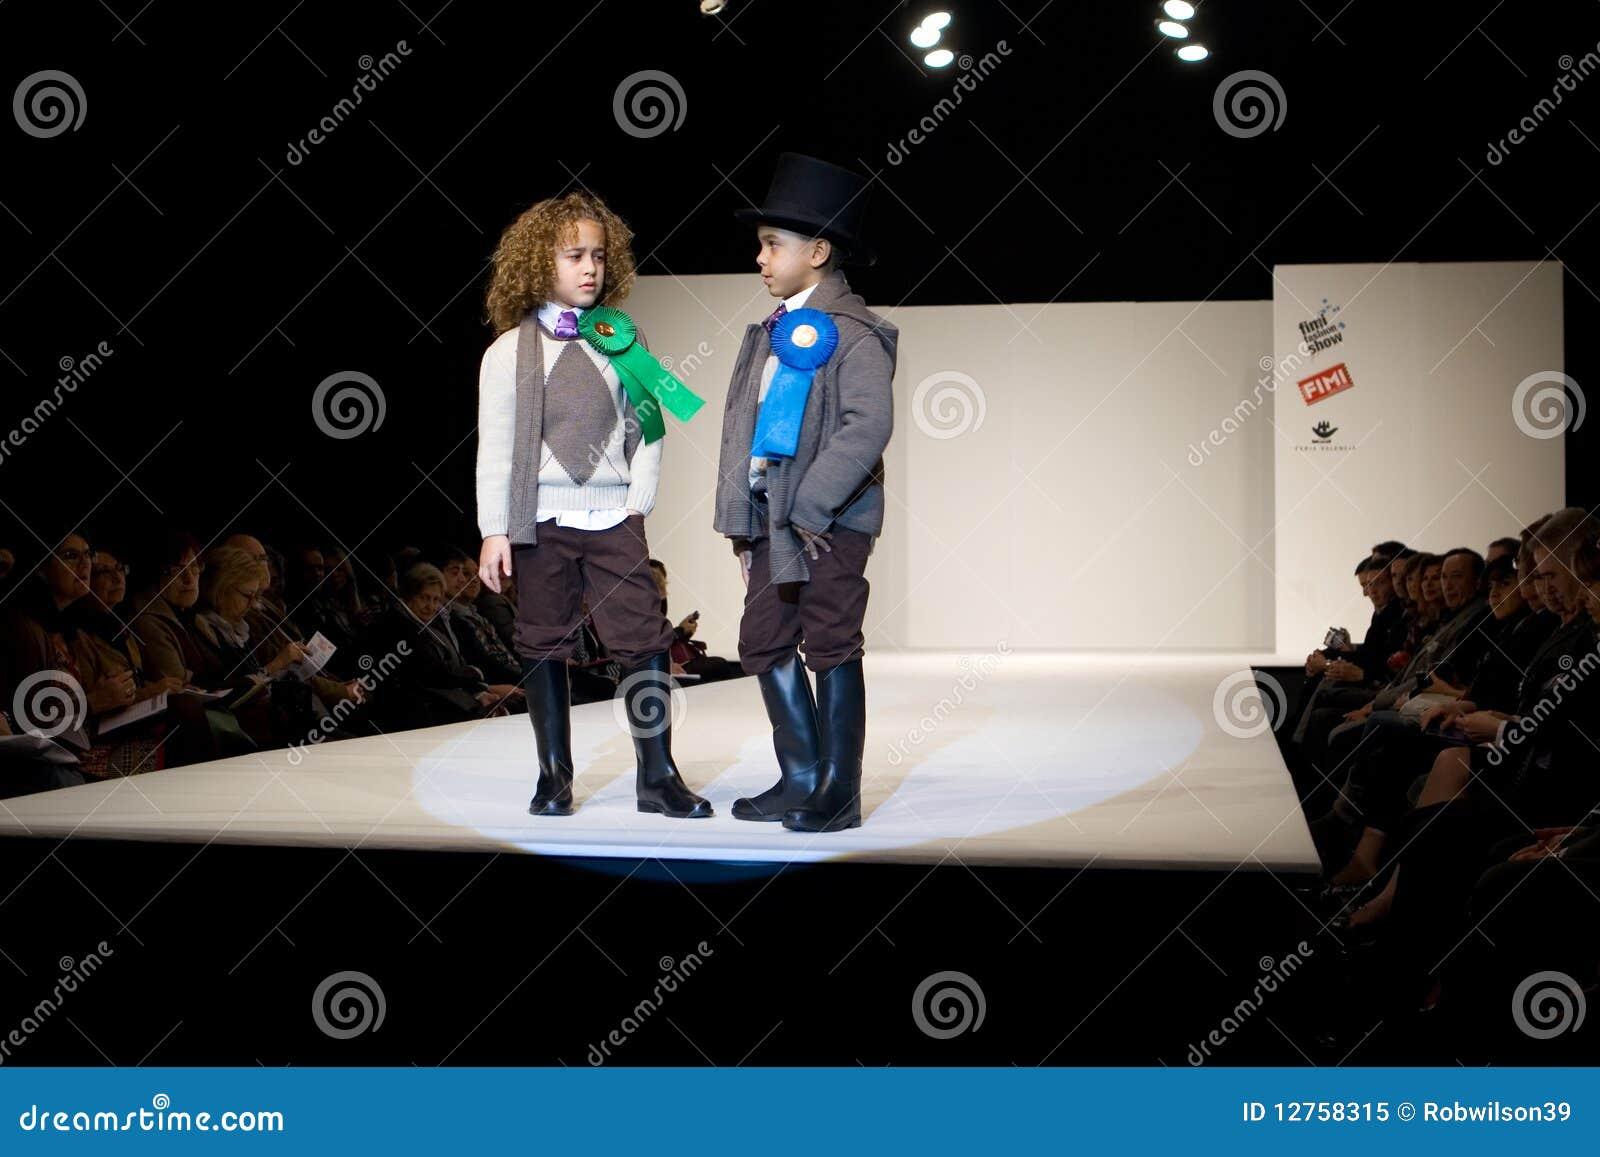 Valencia Fashion Show